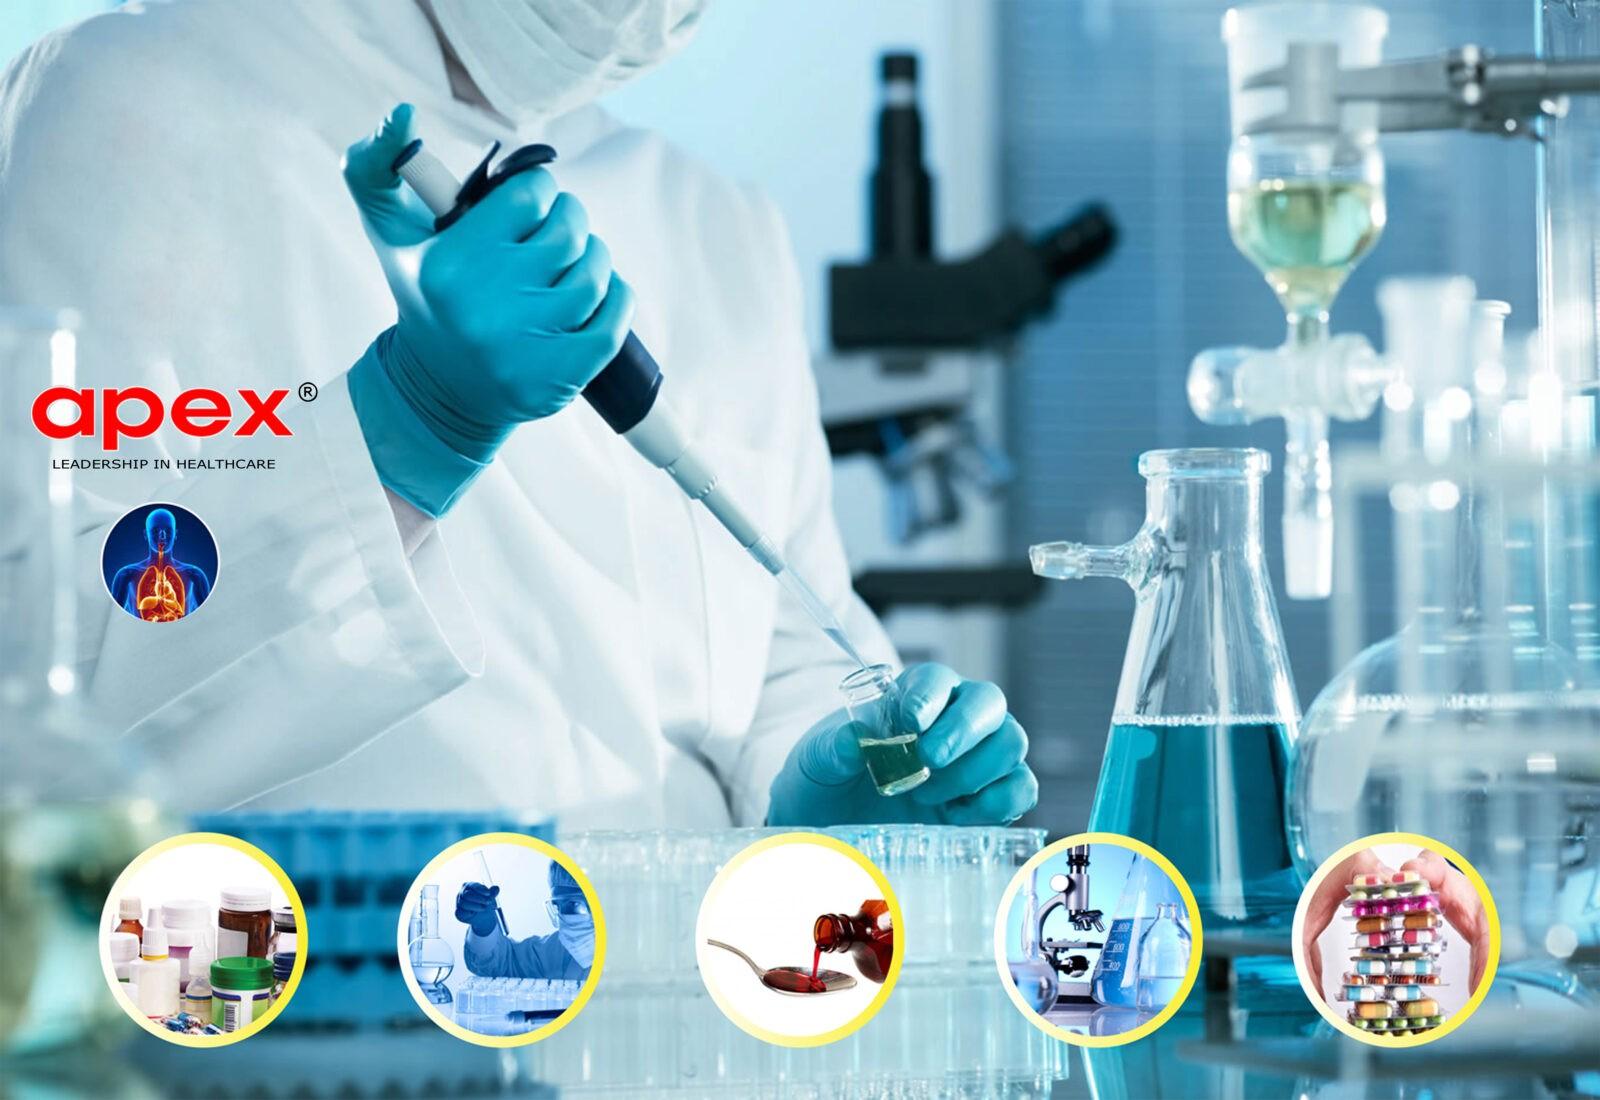 Image 50 - Fastest Growing Pharma Company